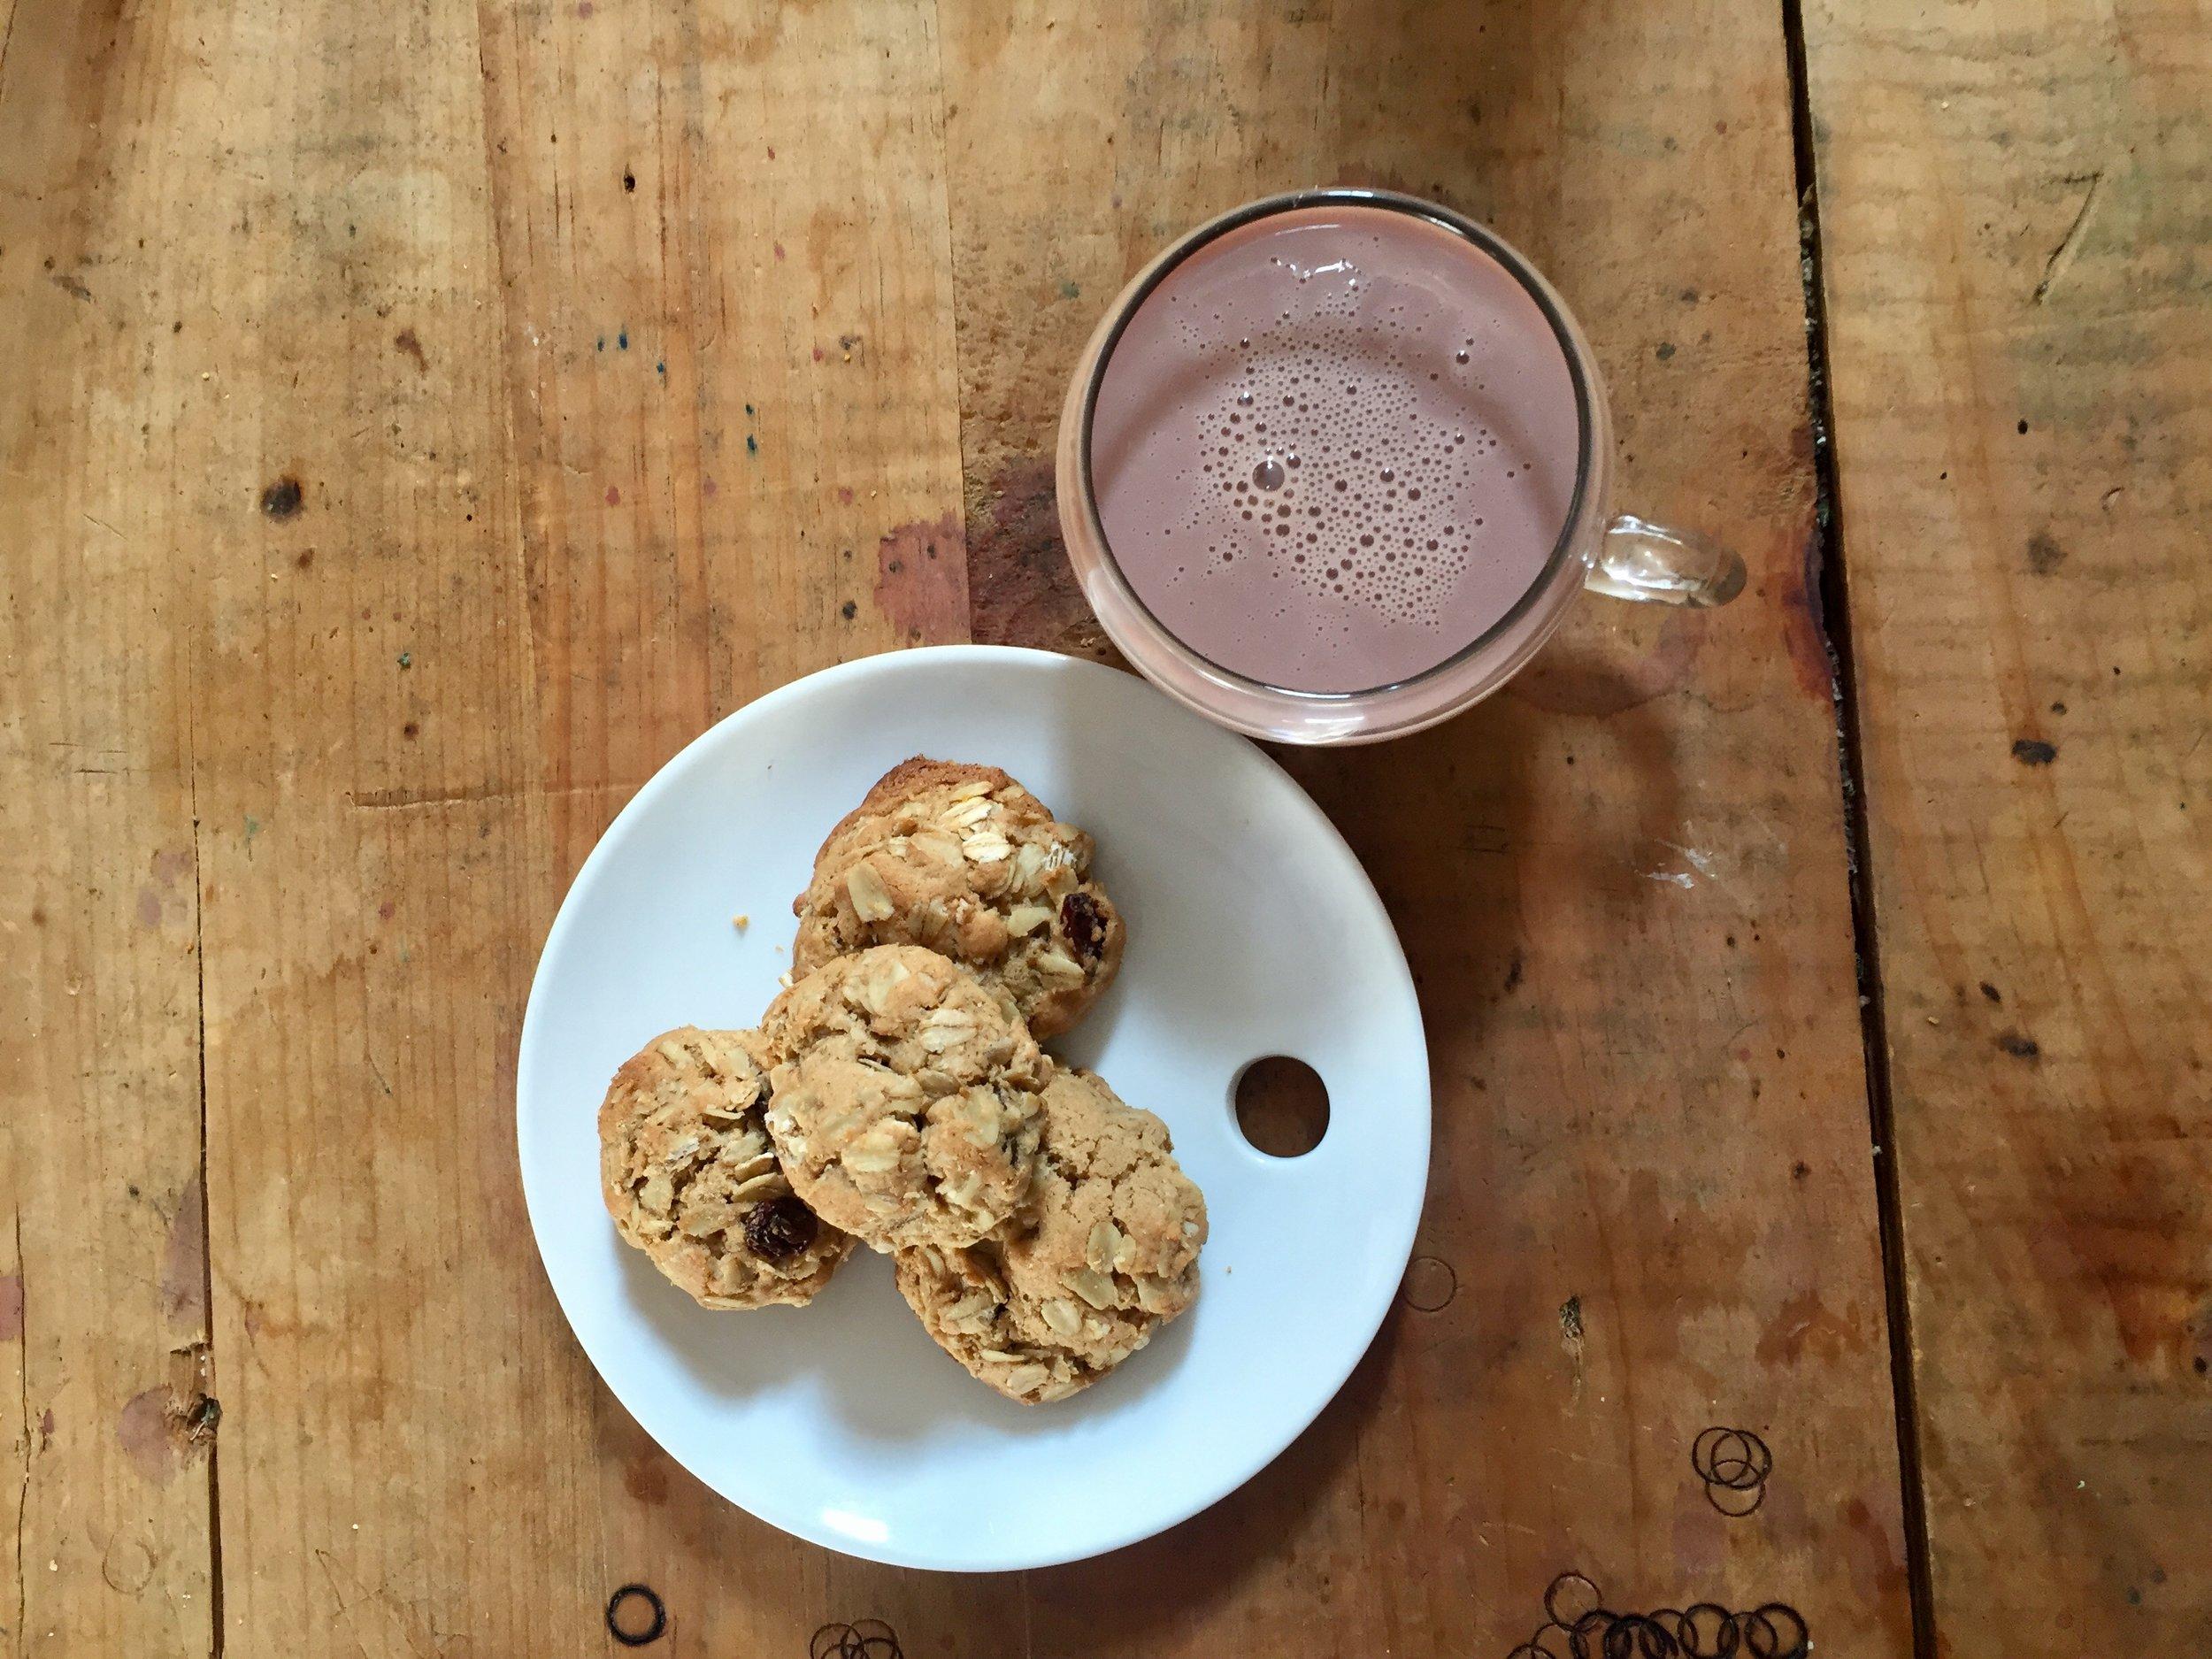 tonic-juicery-cookies-and-milk